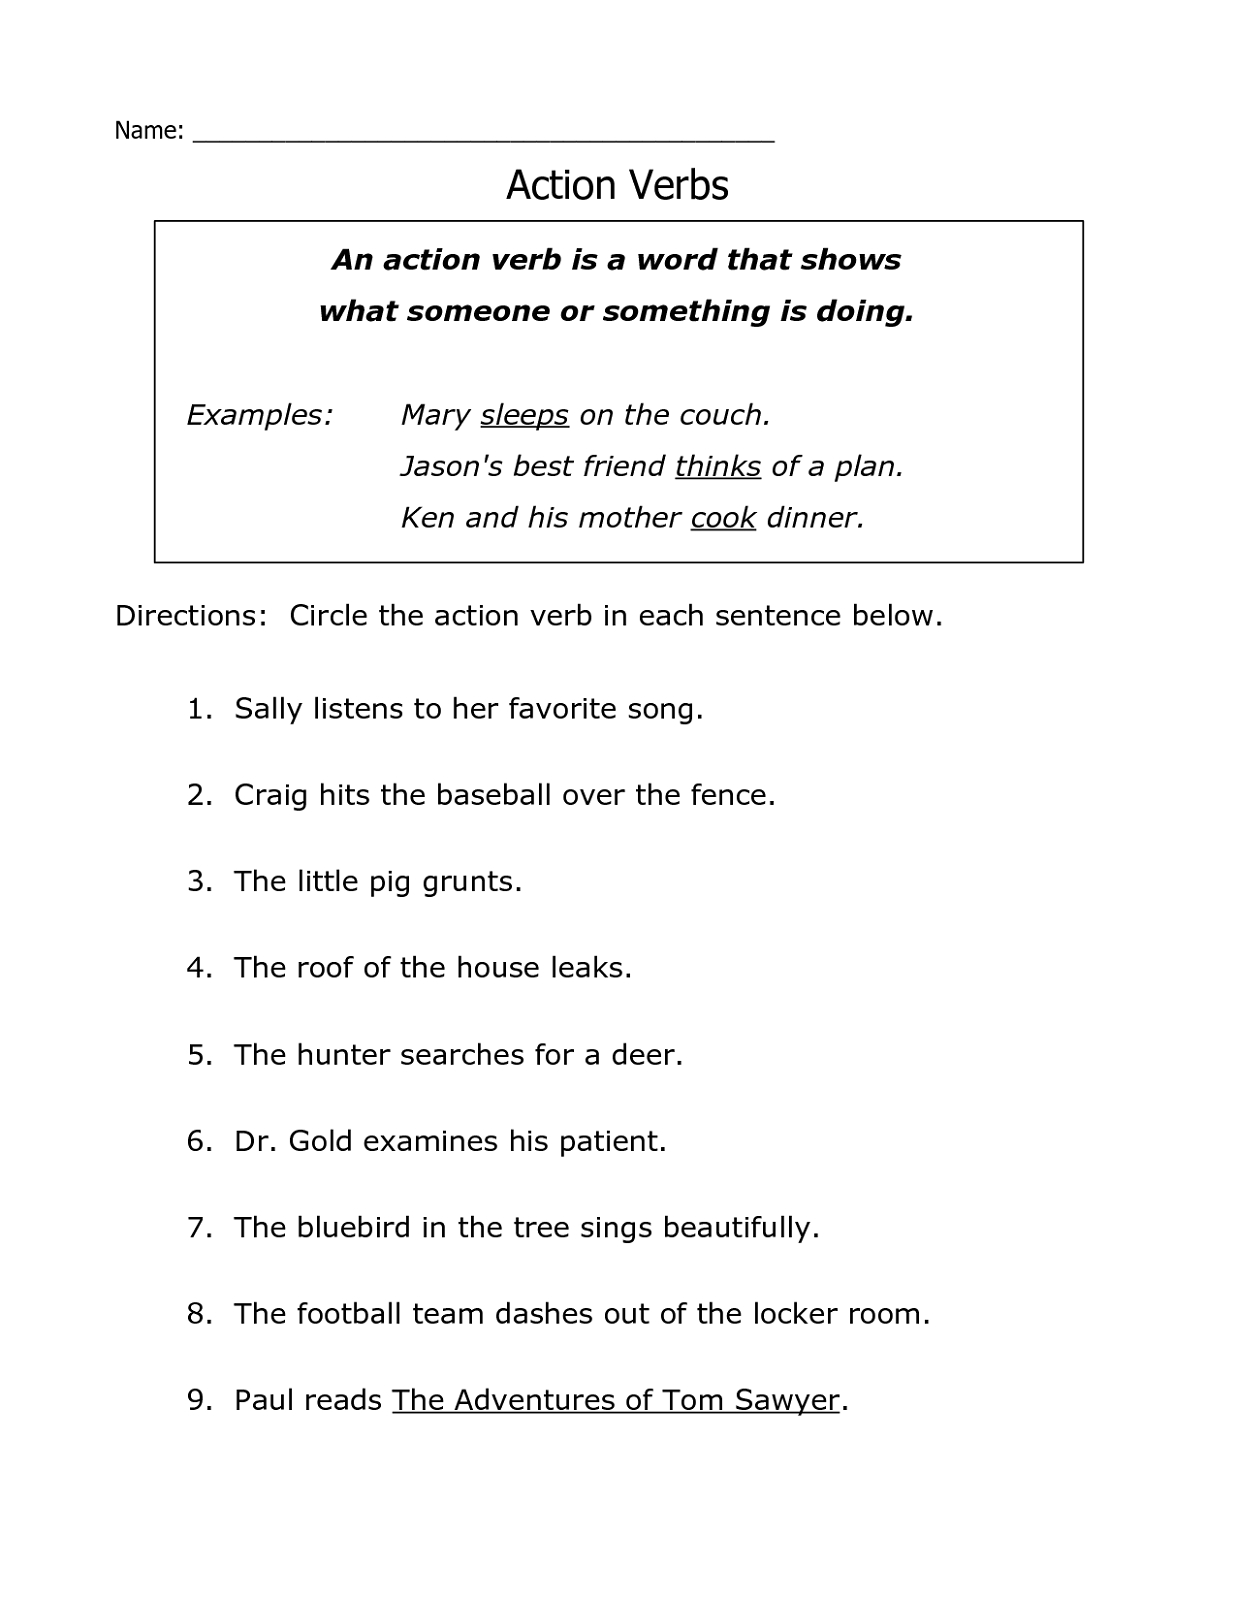 Free Printable Grammar Worksheets Action Verb | K5 Worksheets | Kids - Free Printable Grammar Worksheets